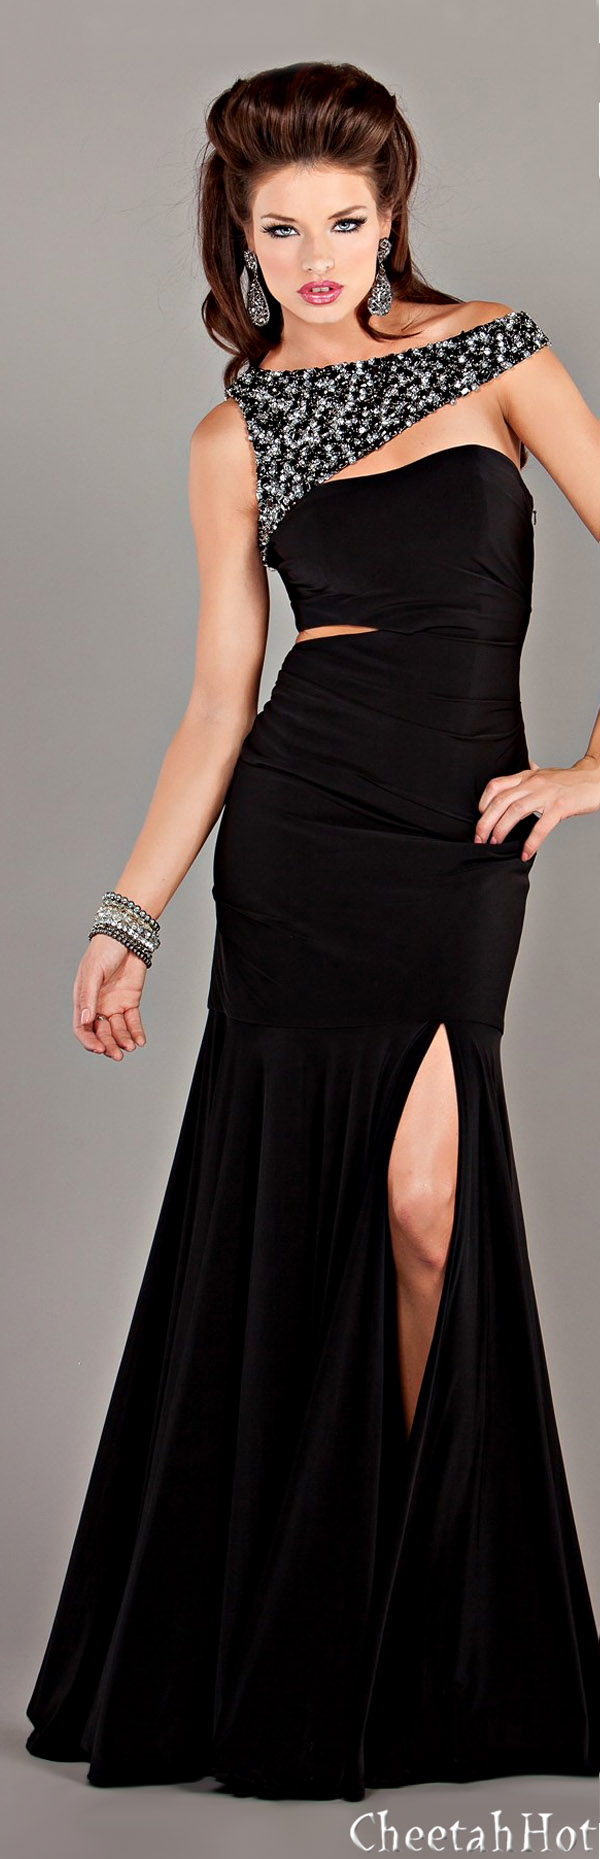 Dresses Page 158 Fashion Gowns Elegant Black Dress Glamorous Dresses [ 1859 x 600 Pixel ]